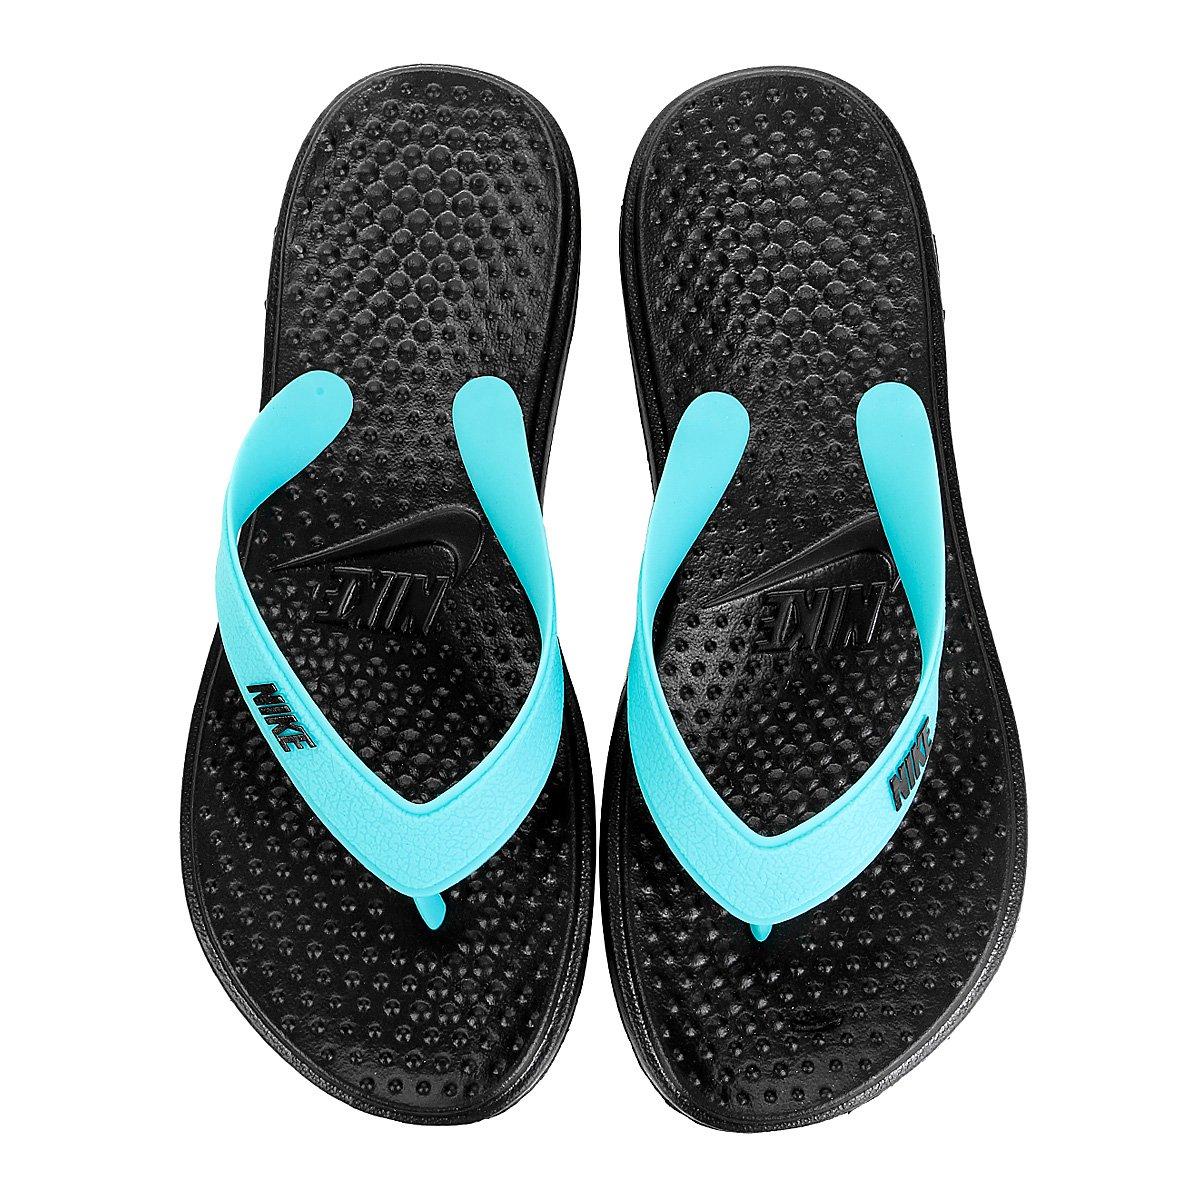 Thong Parque Solay Nike Wmns Sandália Shop Feminina PretoAllianz xeBodC